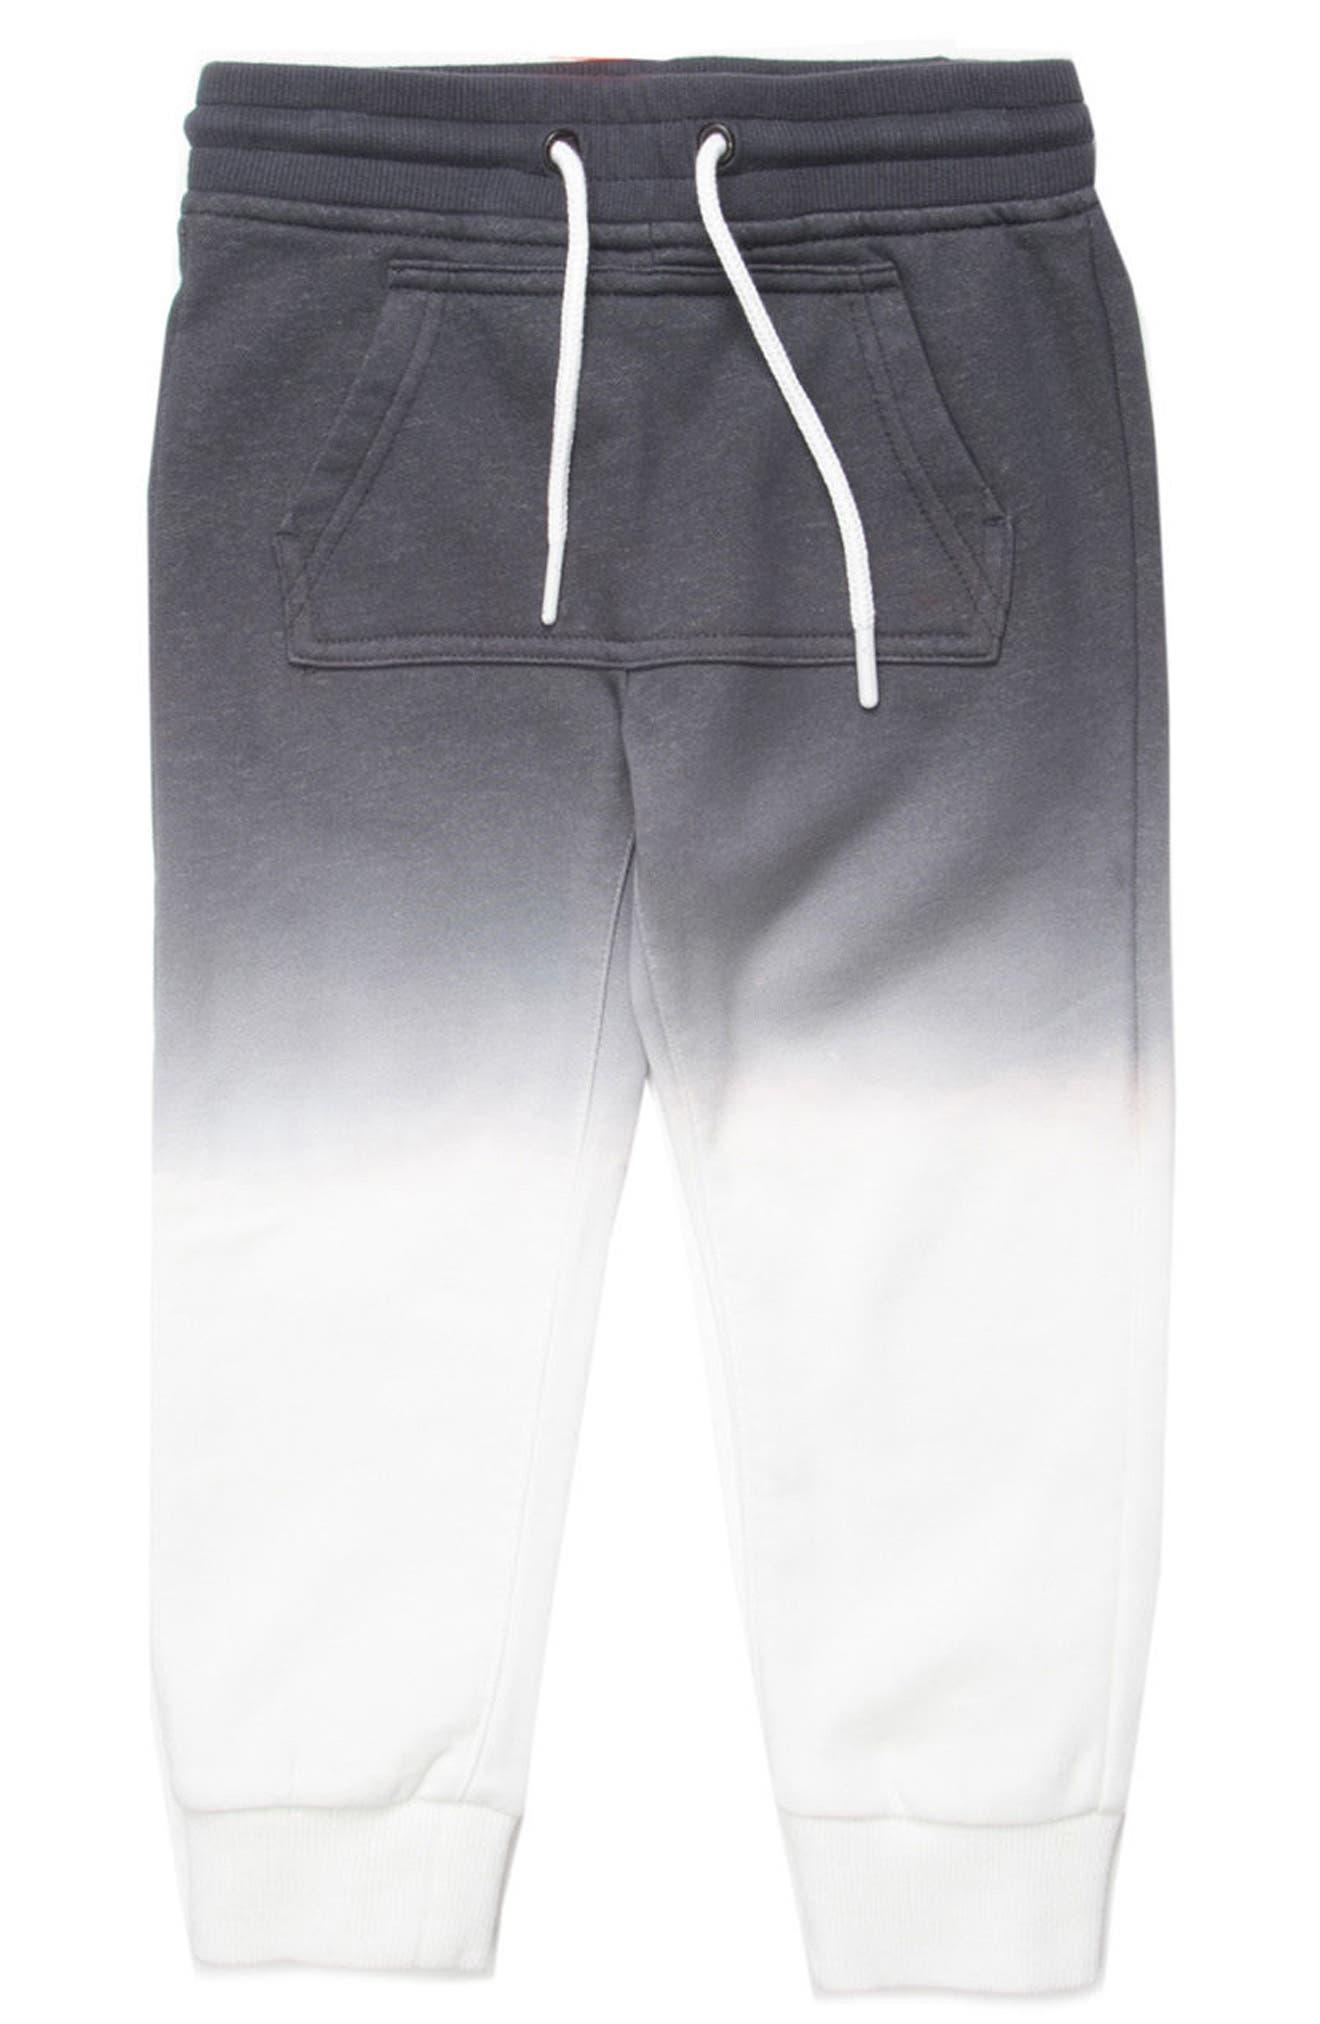 Gino Ombré Jogger Pants,                         Main,                         color, Black